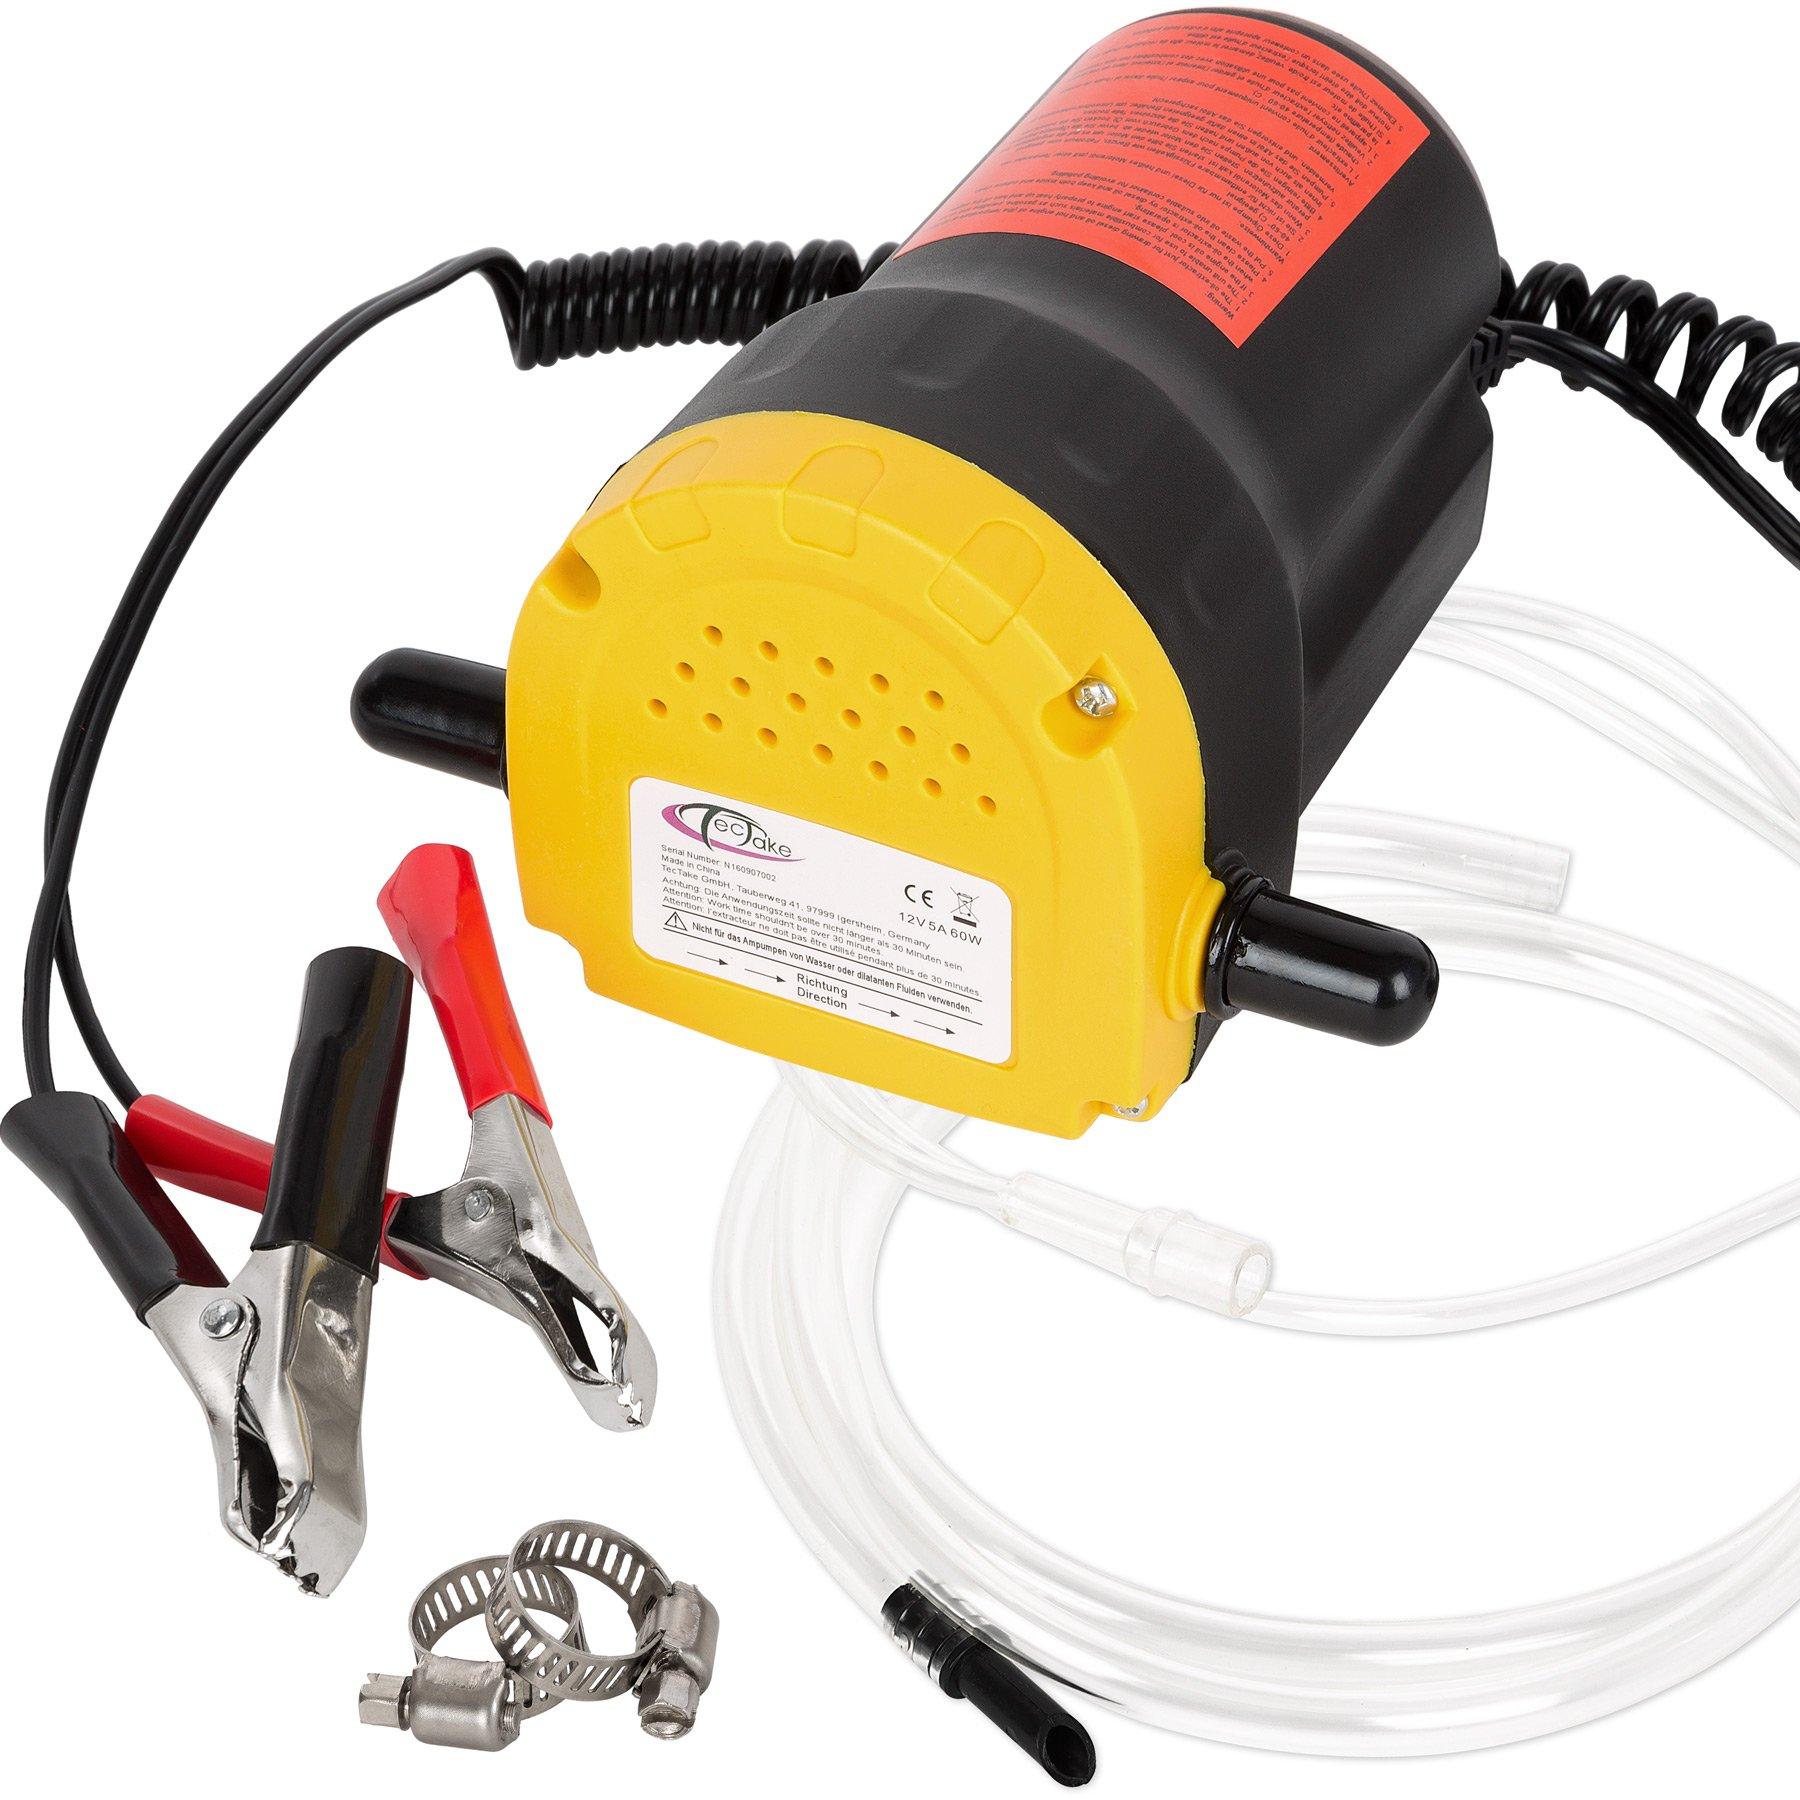 Nanopolitur TecTake 400468 Poliermaschine 1500 Watt mit Drehgriff 0-3200 U//min Set11 inkl